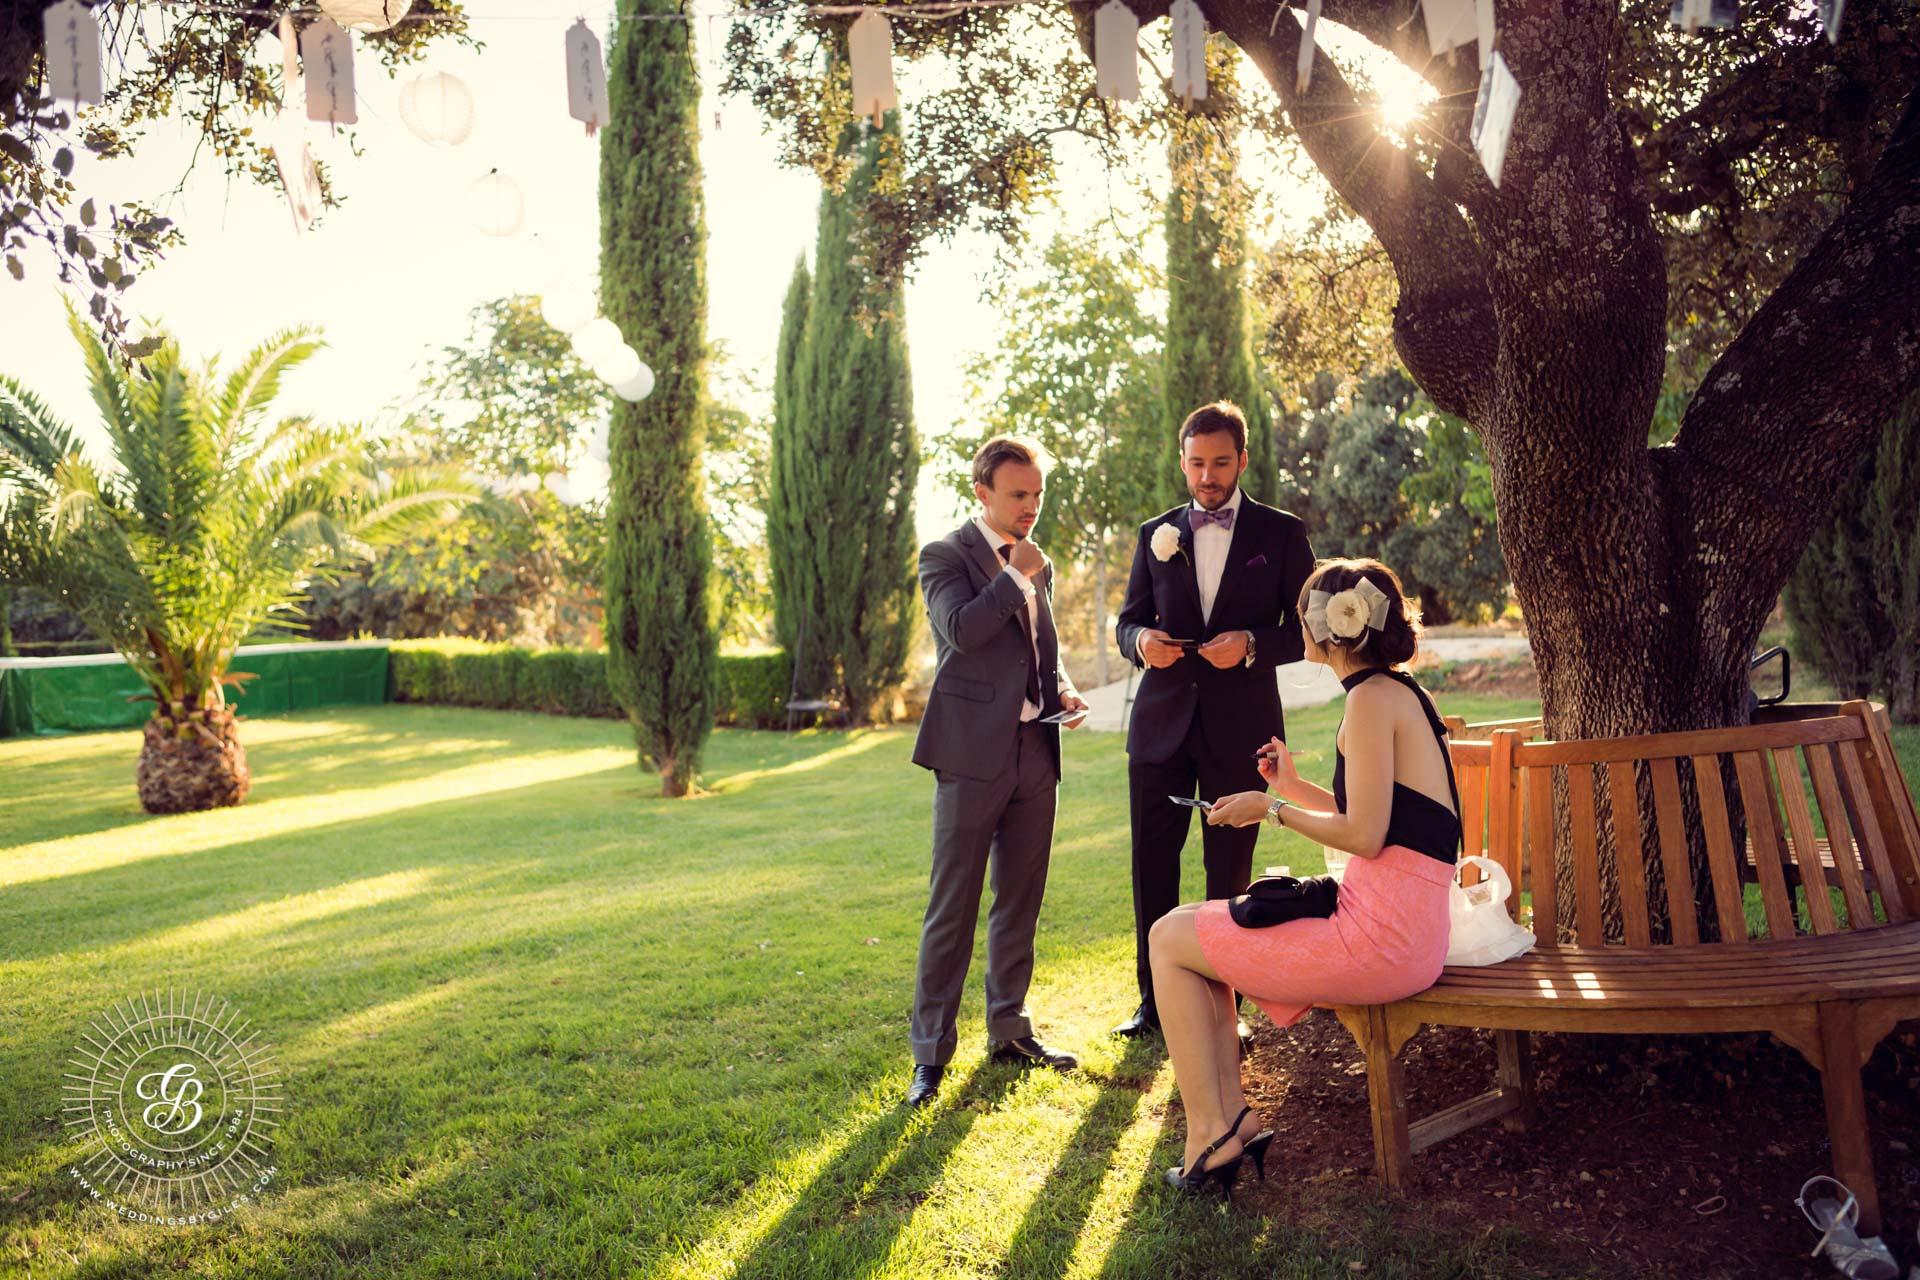 evening light garden wedding in spain